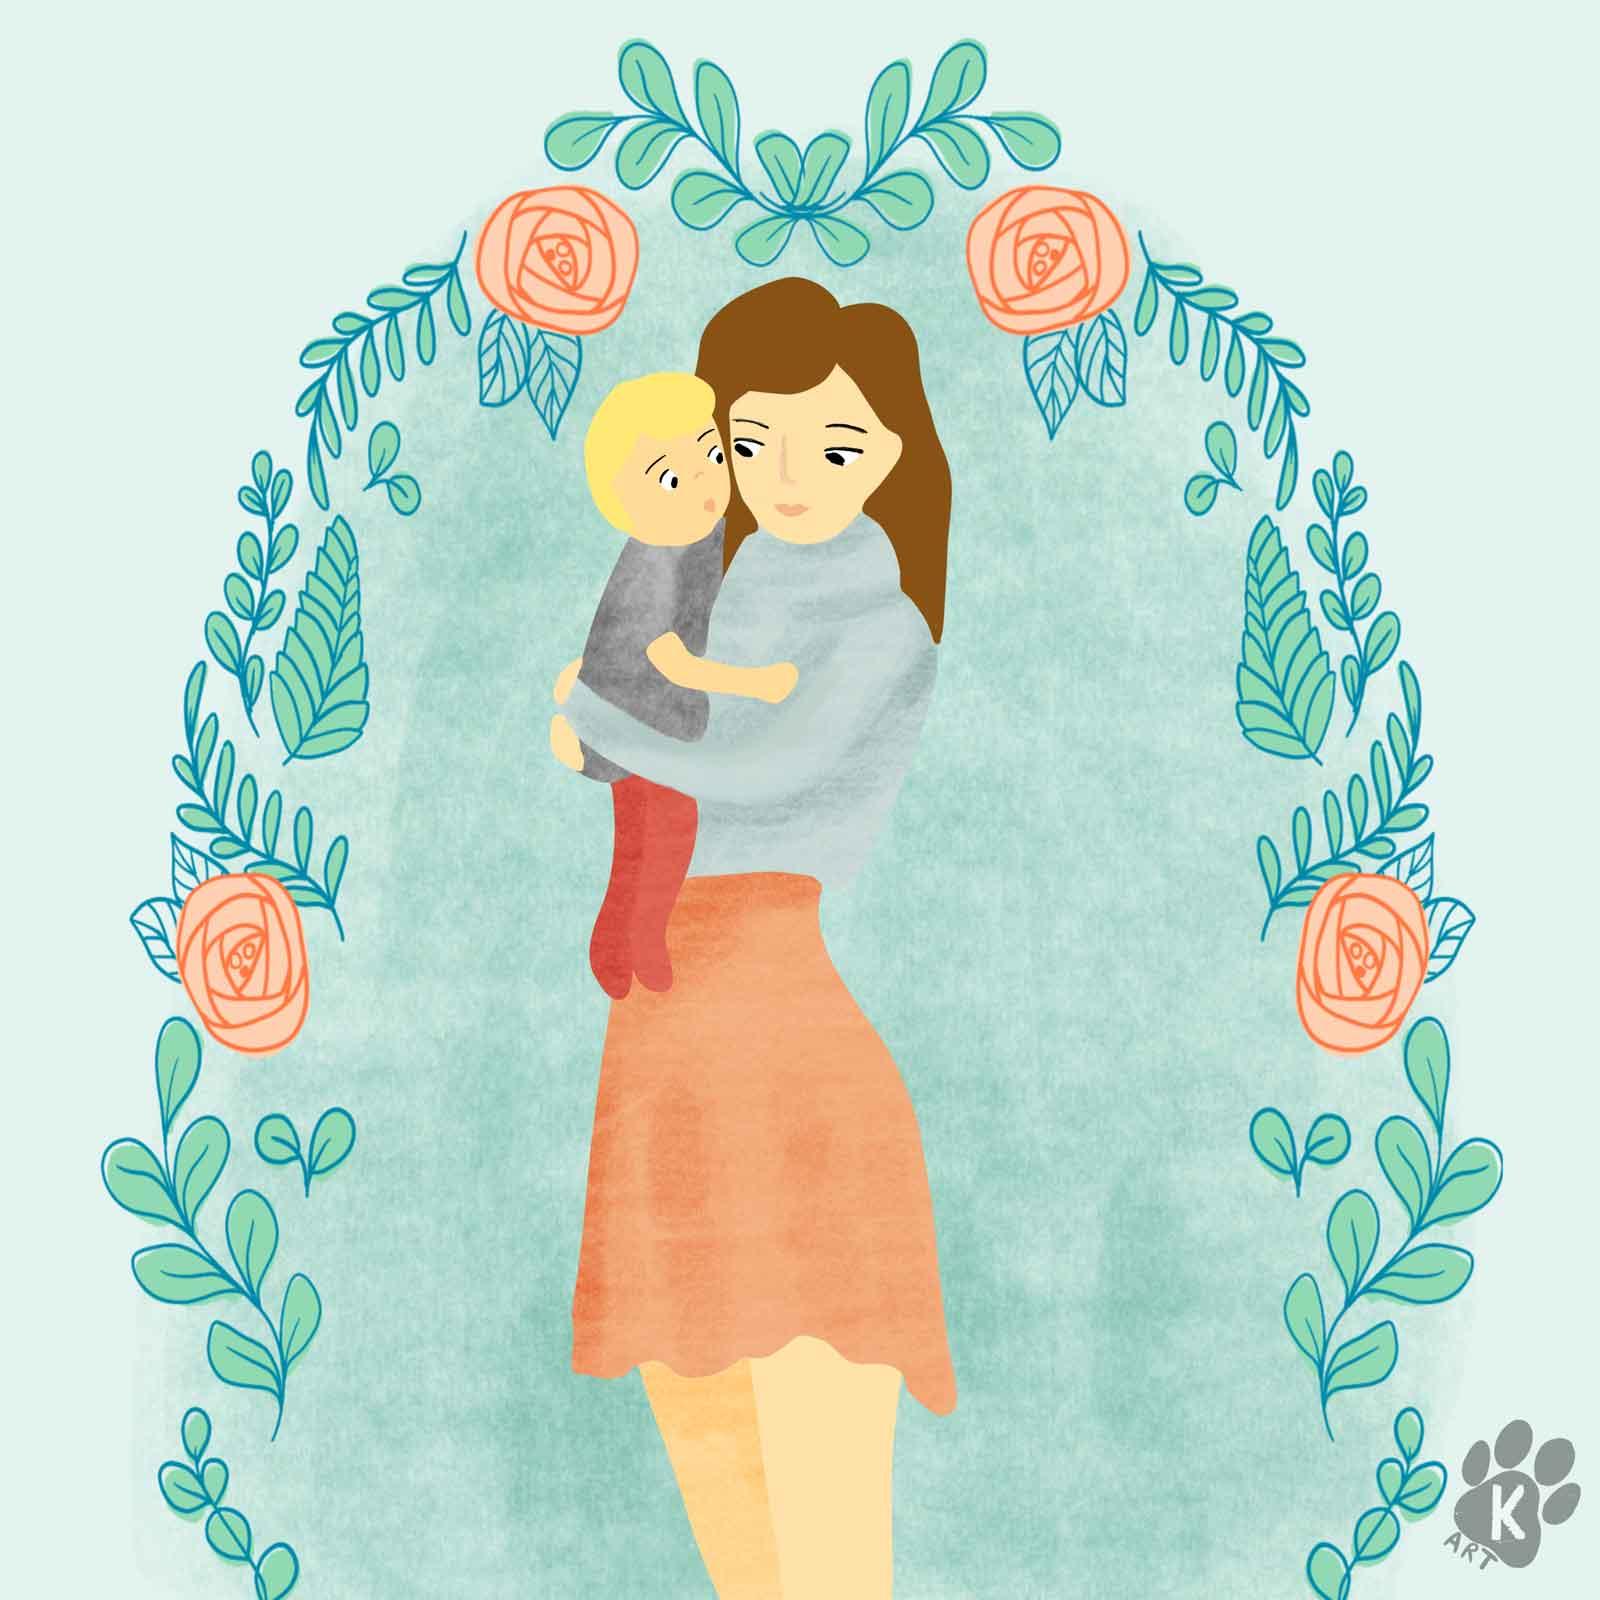 mum and child comission portrait